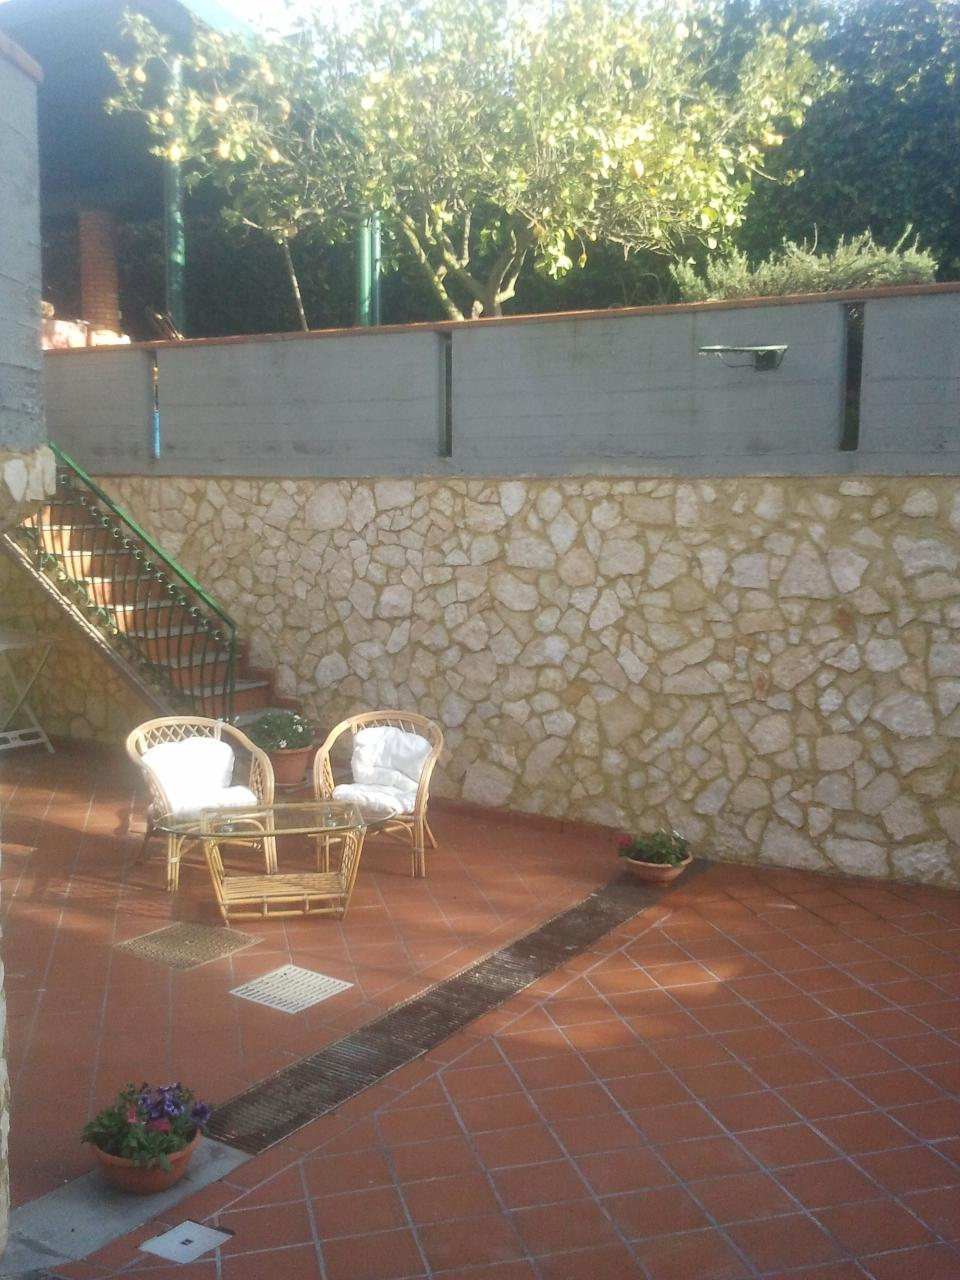 Appartement de vacances ZUHAUSE VON EMILIA - zwischen Ätna und Taormina (1743739), Aci Sant'Antonio, Catania, Sicile, Italie, image 10